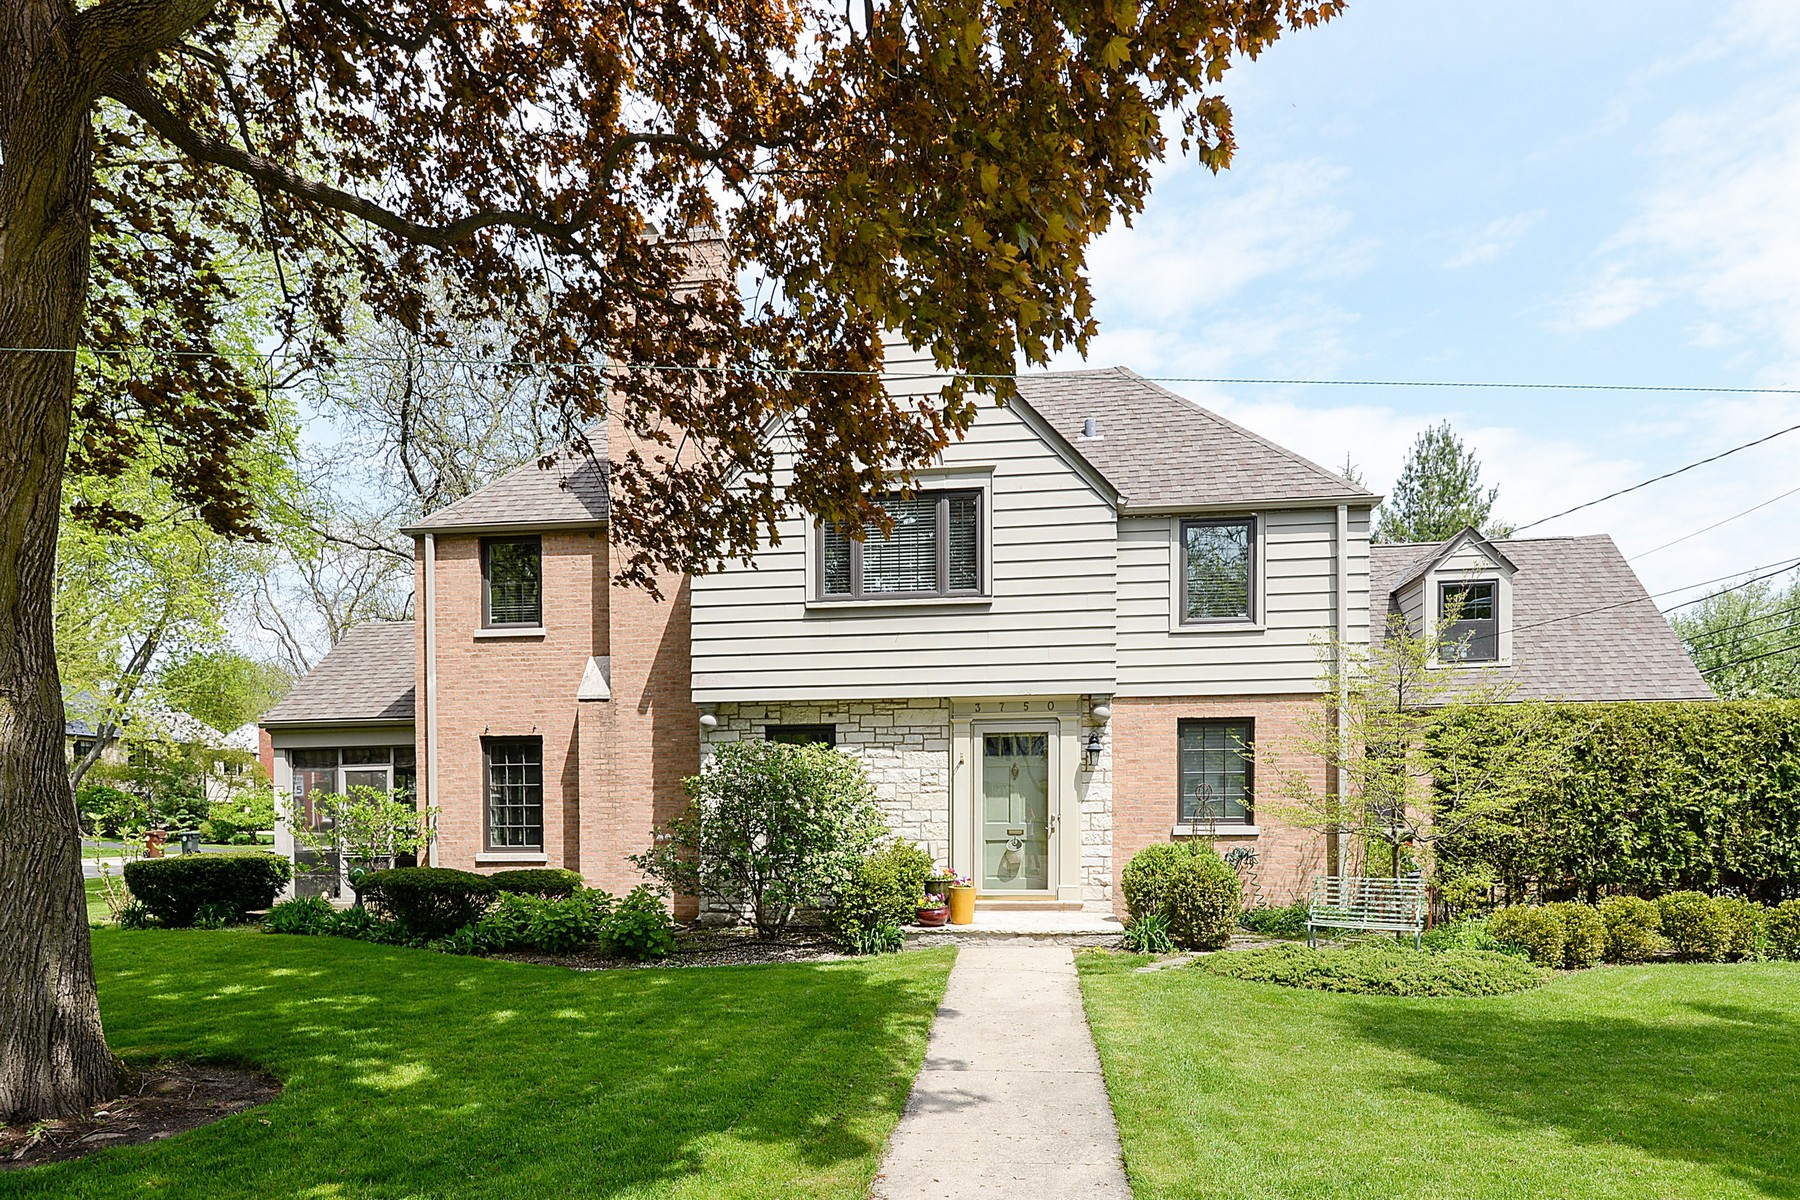 Casa Unifamiliar por un Venta en Beautiful Sun-filled Home With Many Architectural Details 3750 Foster Street Evanston, Illinois, 60203 Estados Unidos